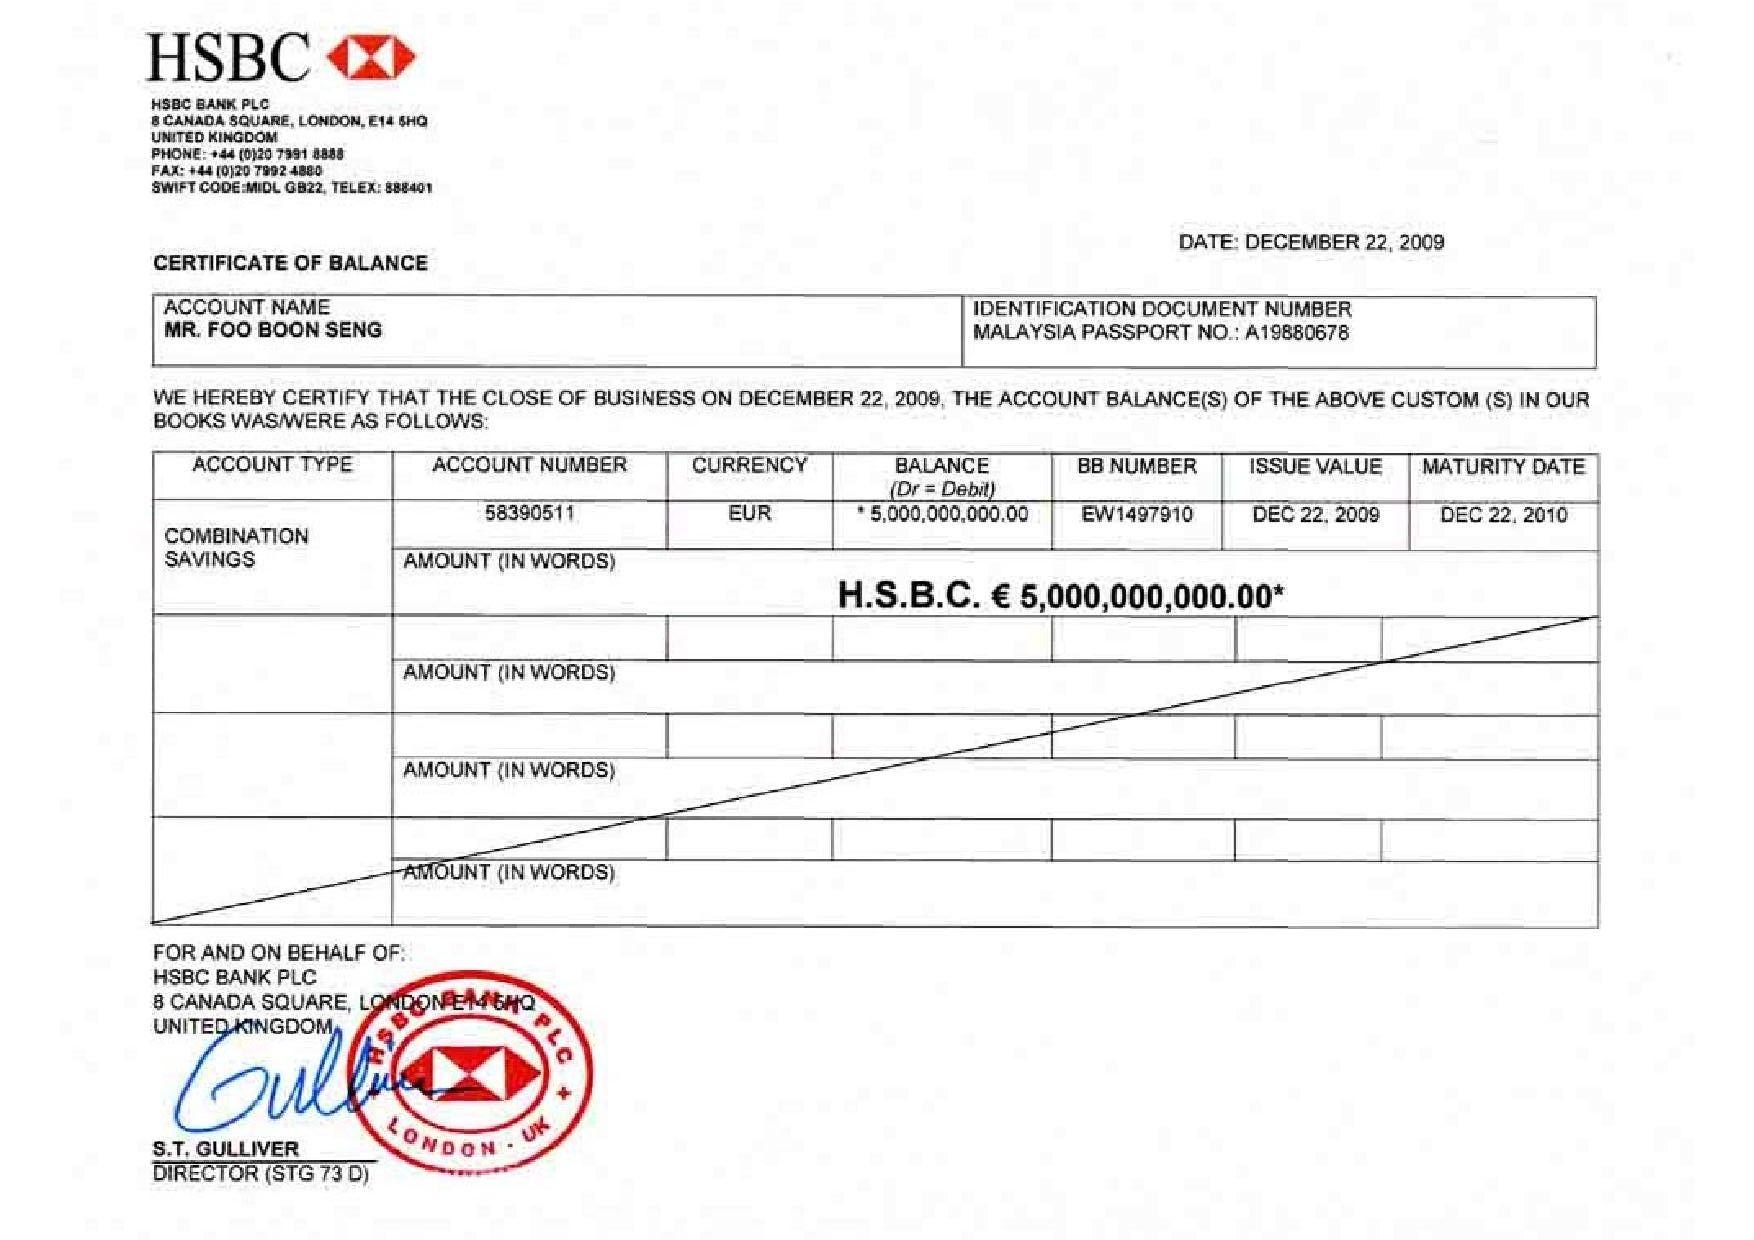 letter sample bank account verification certification hsbc